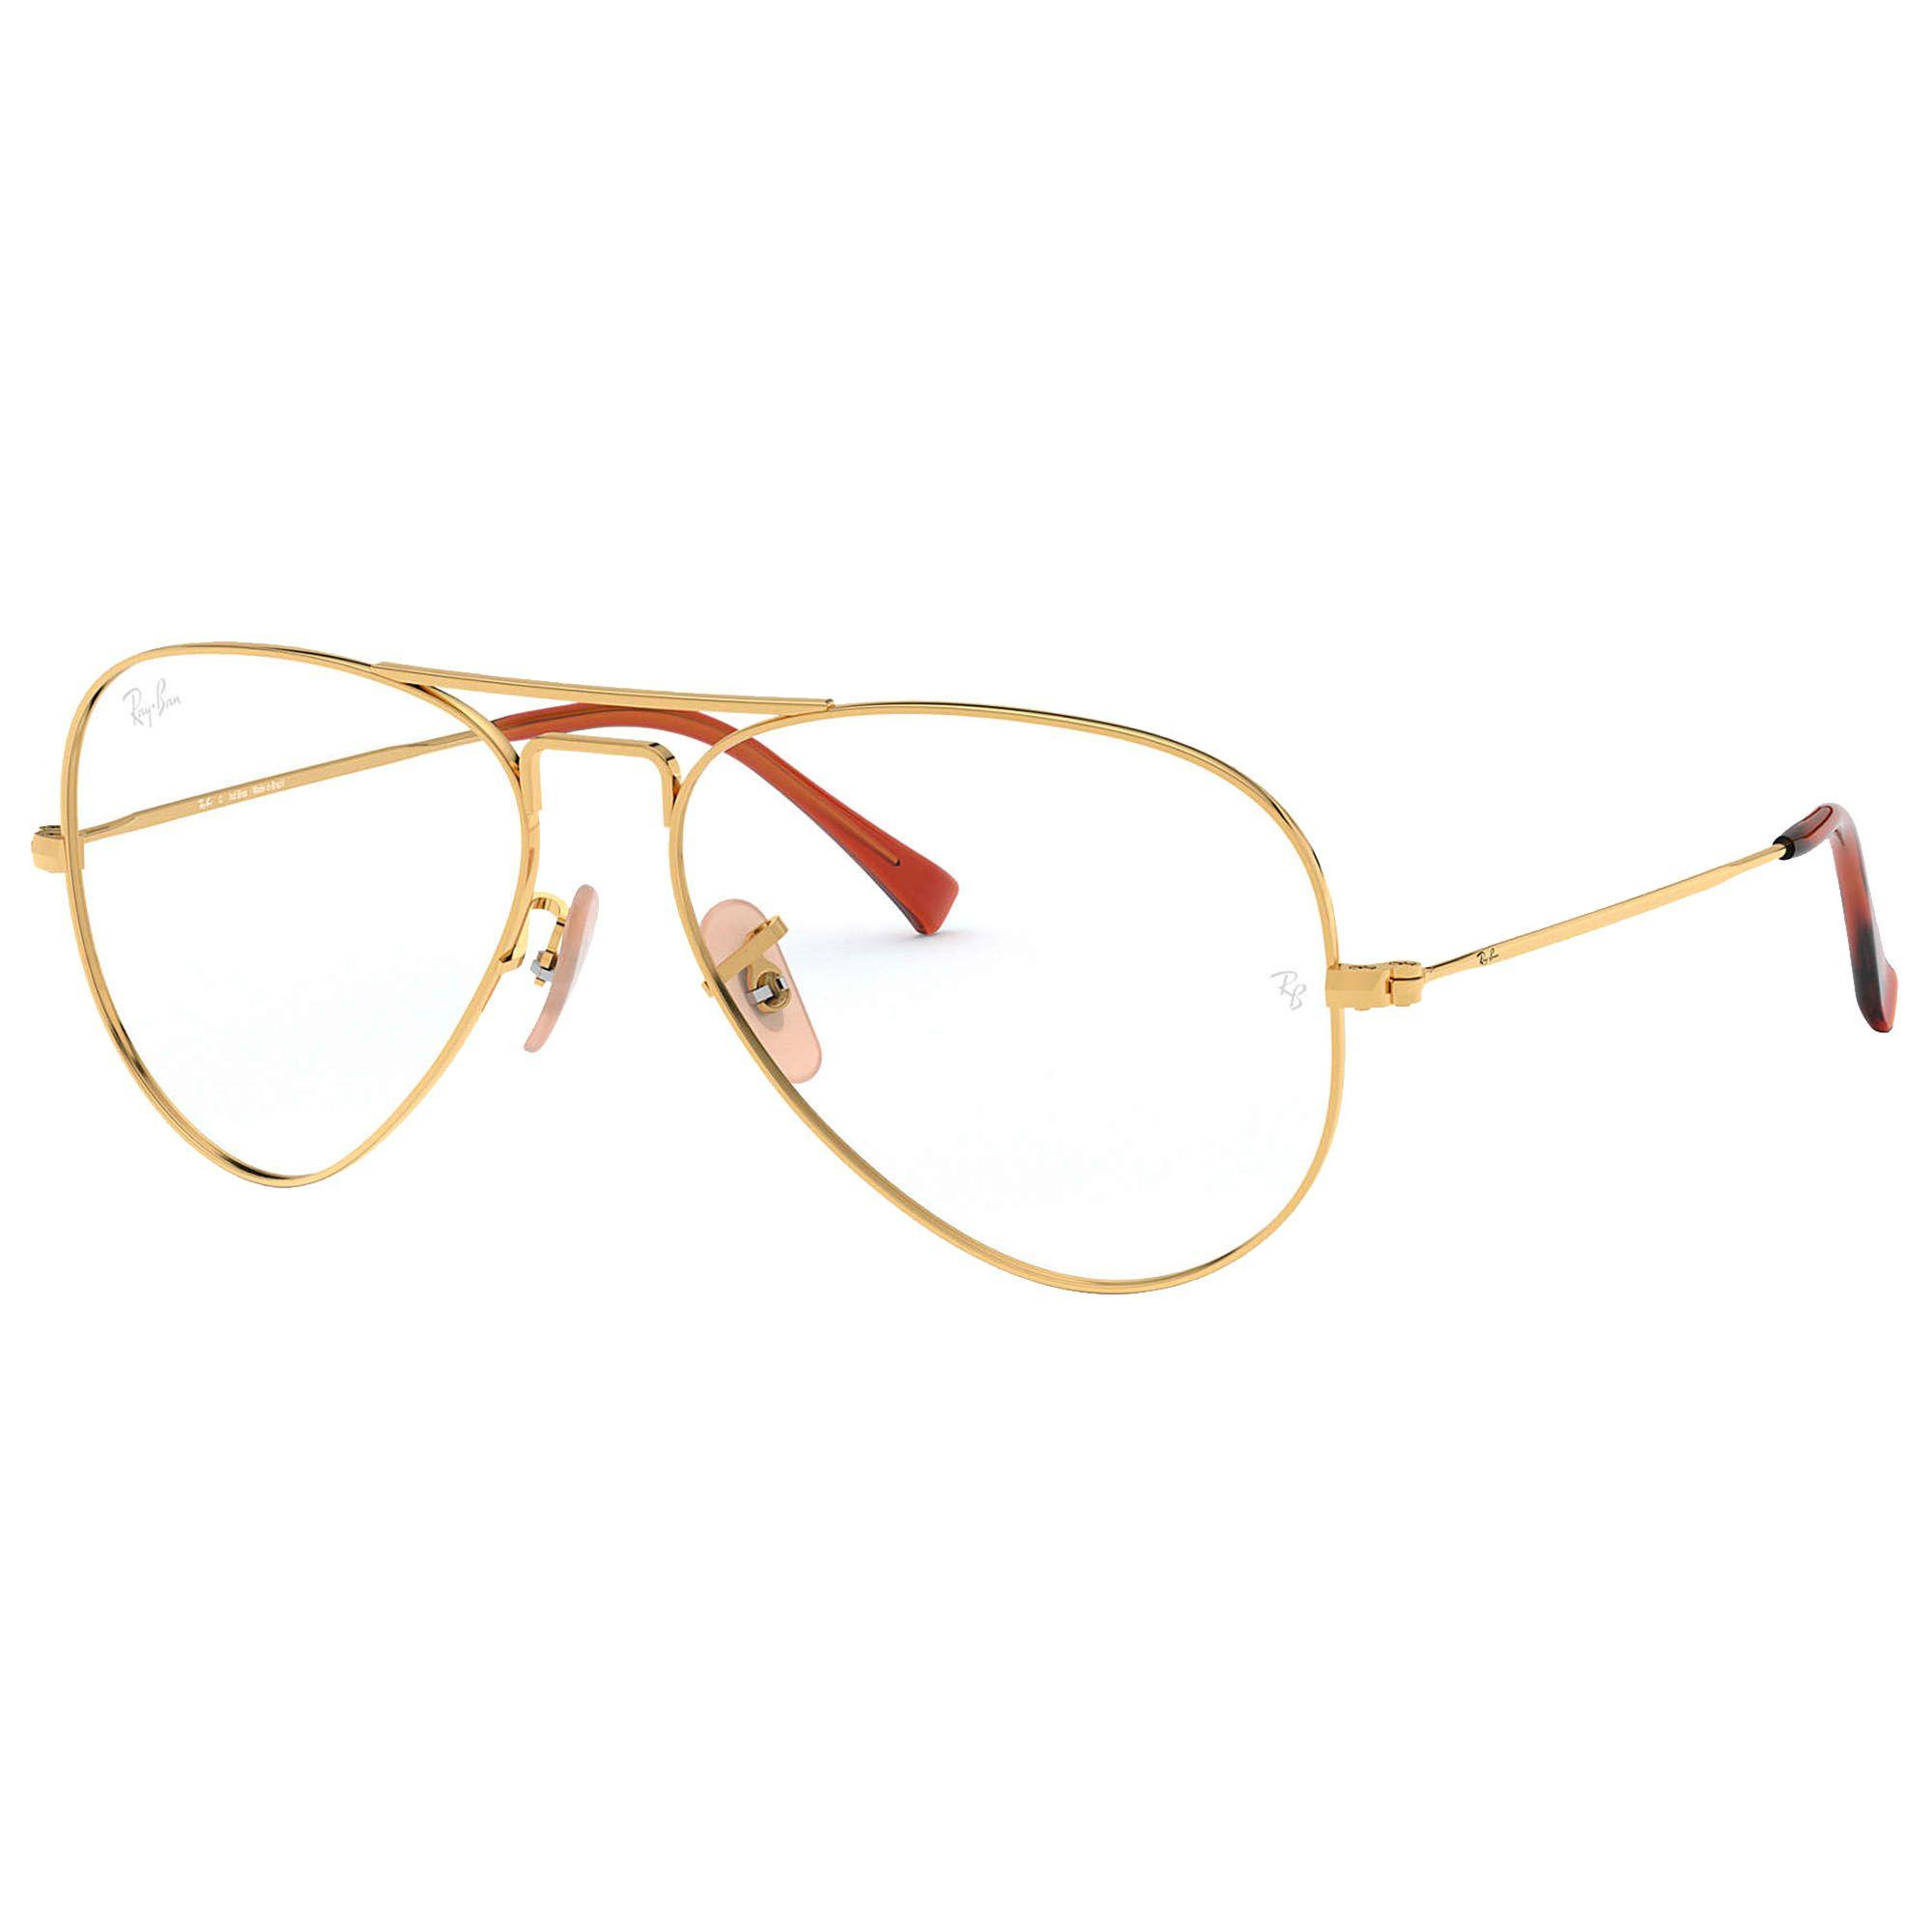 Óculos de Grau Unissex Ray-Ban Aviator Optics RB6049L 2500 55-14